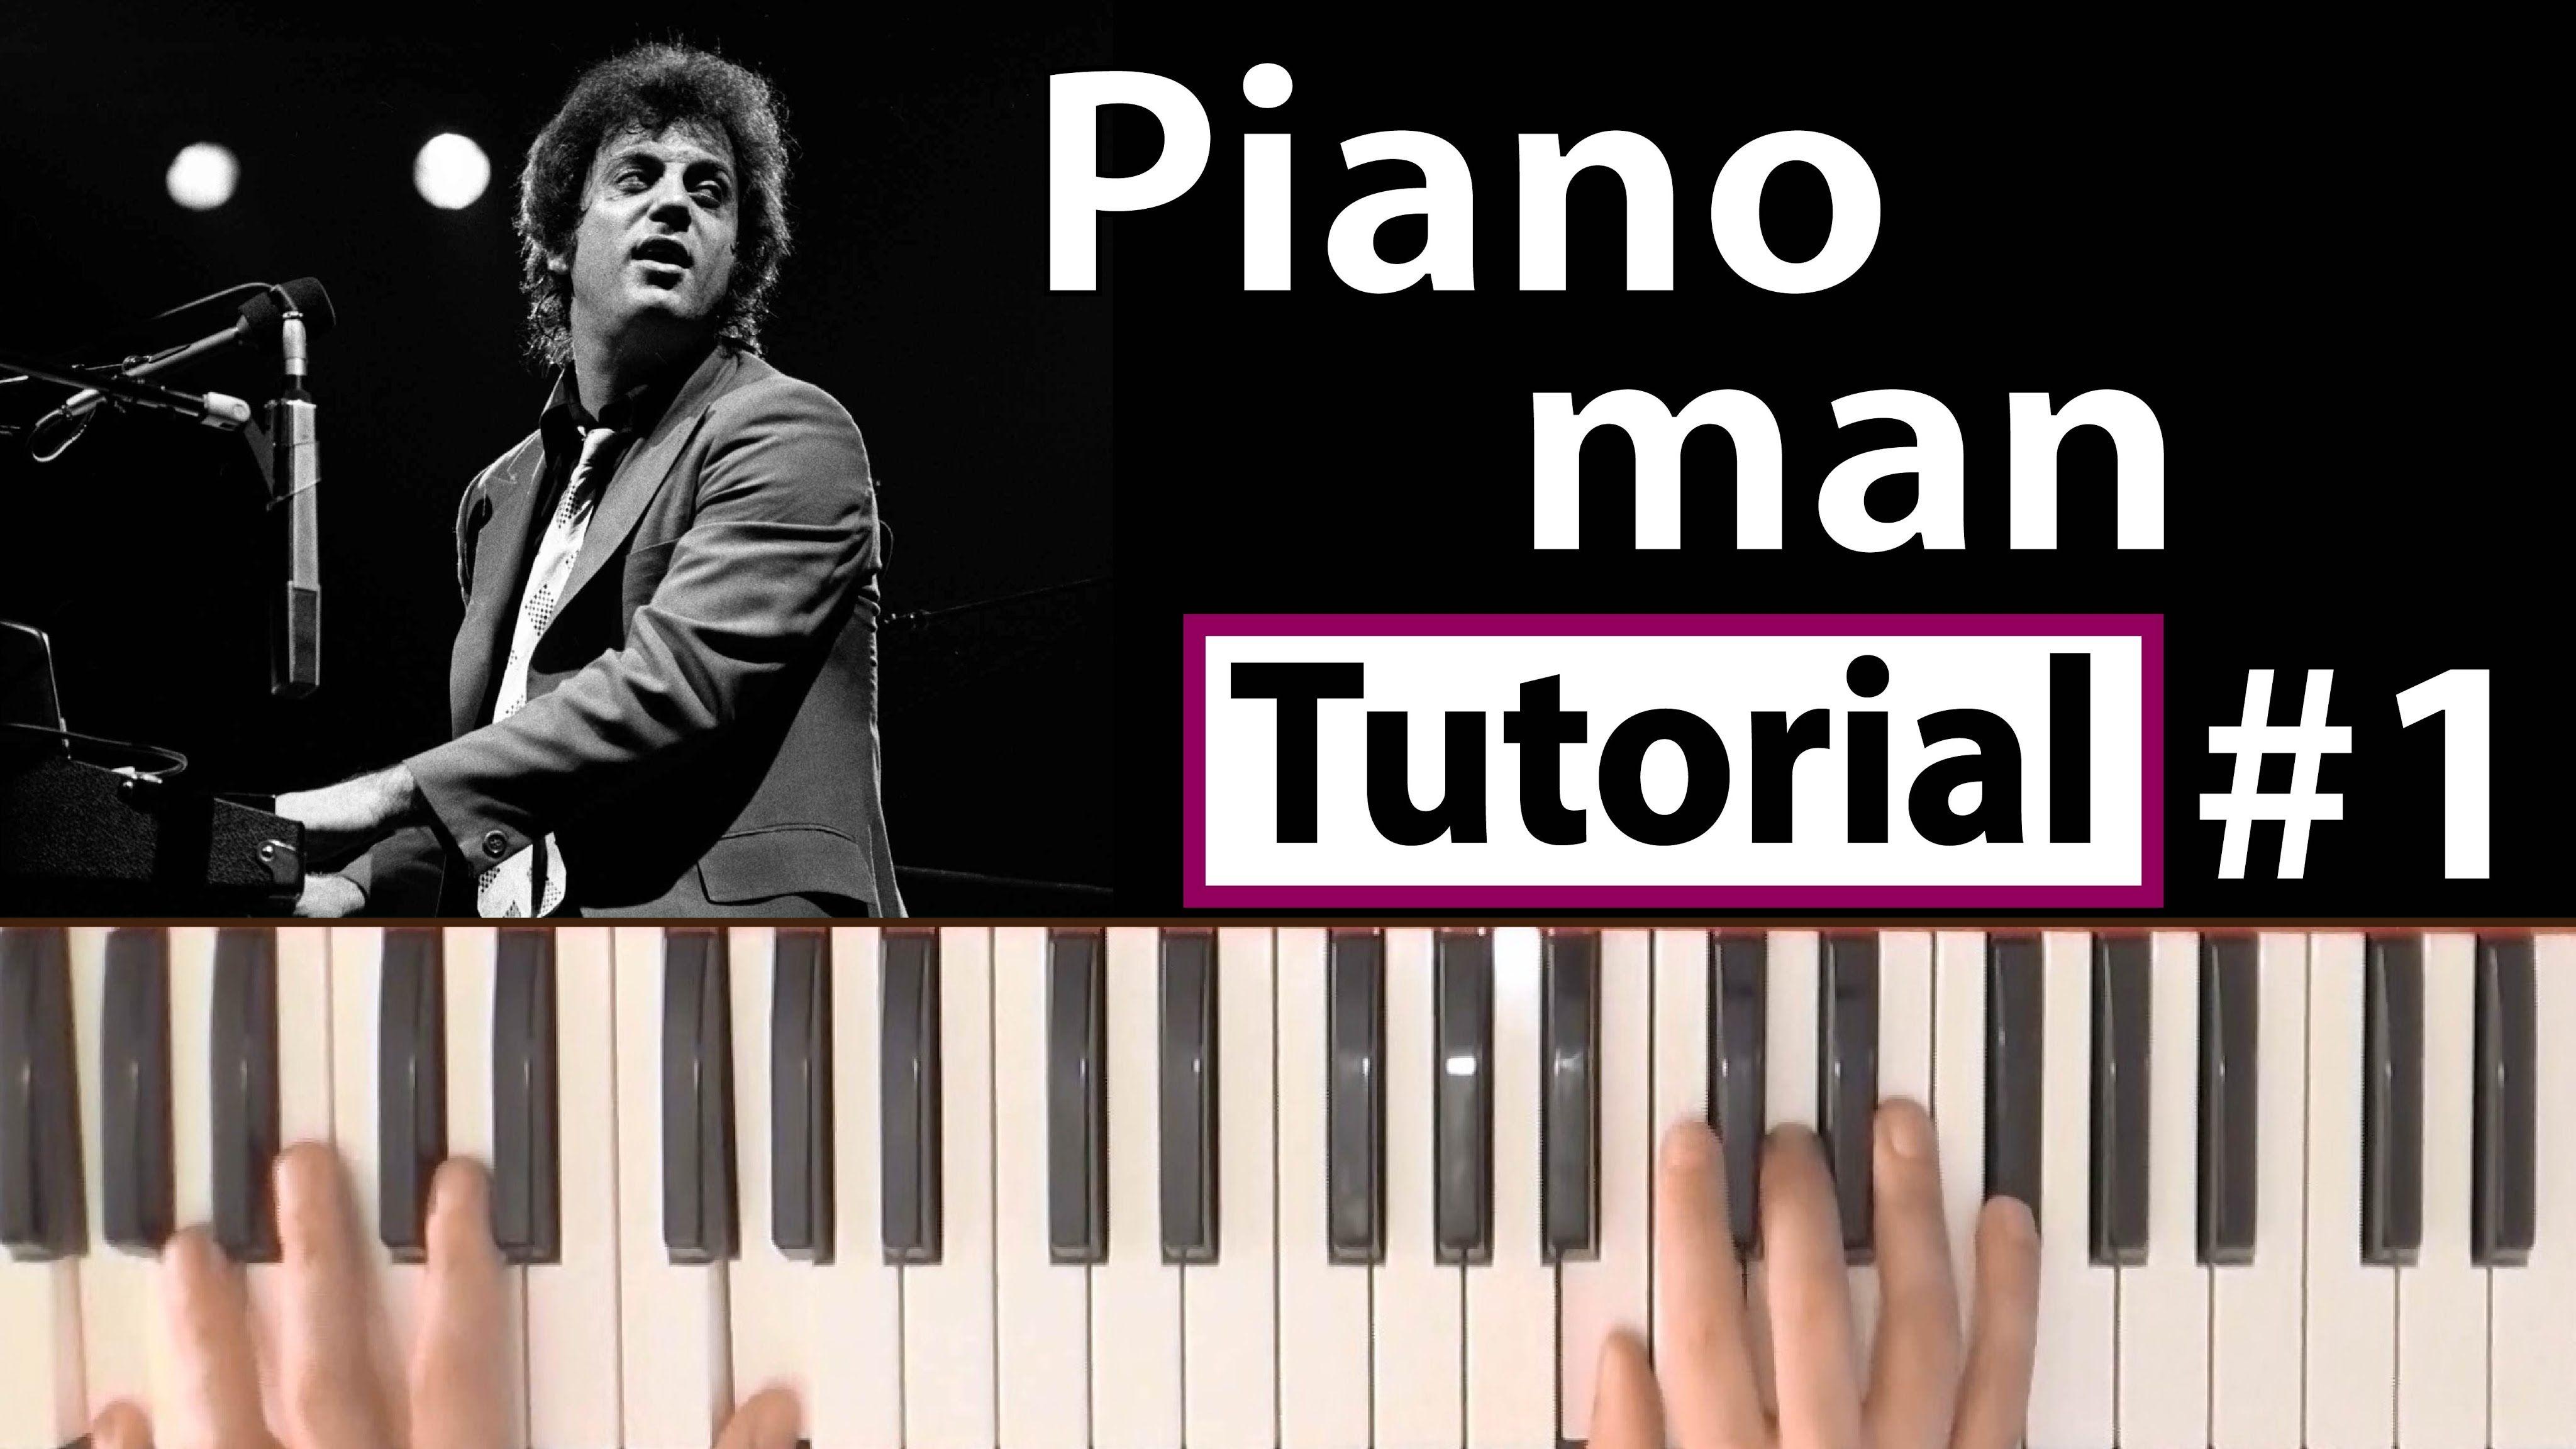 billy joel piano man tutorial